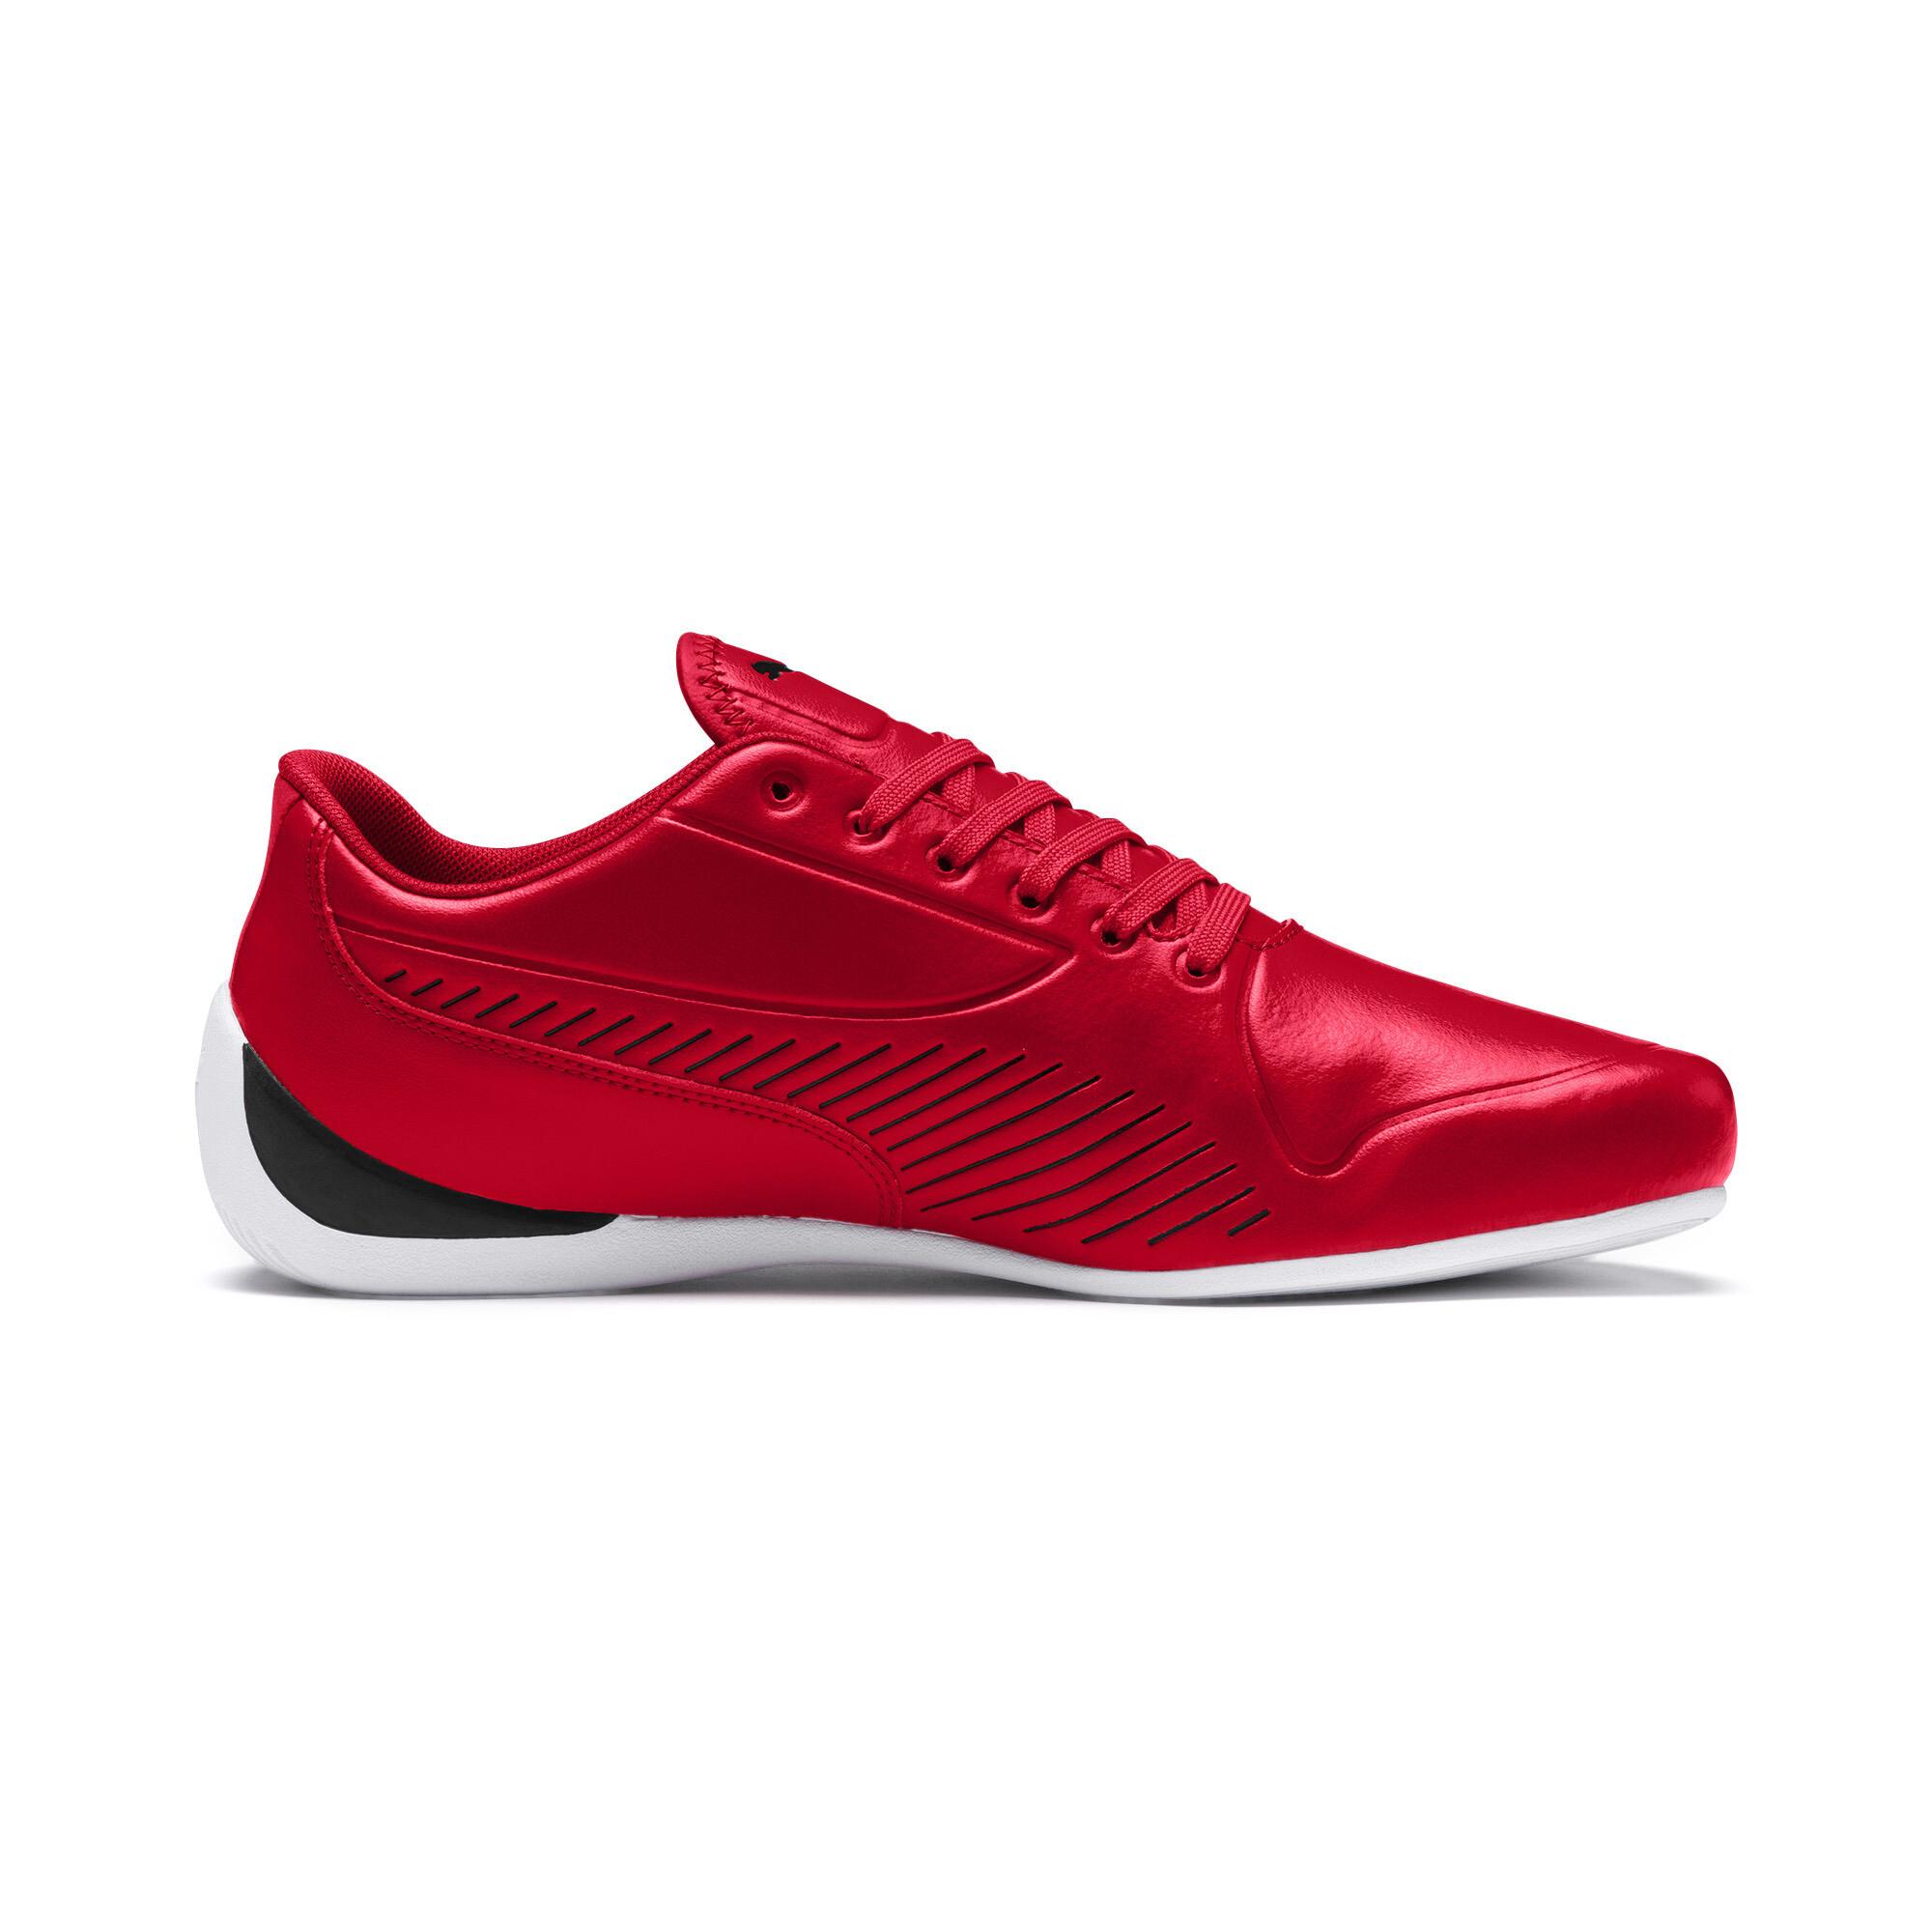 PUMA-Scuderia-Ferrari-Drift-Cat-7S-Ultra-Men-039-s-Shoes-Men-Shoe-Auto thumbnail 12